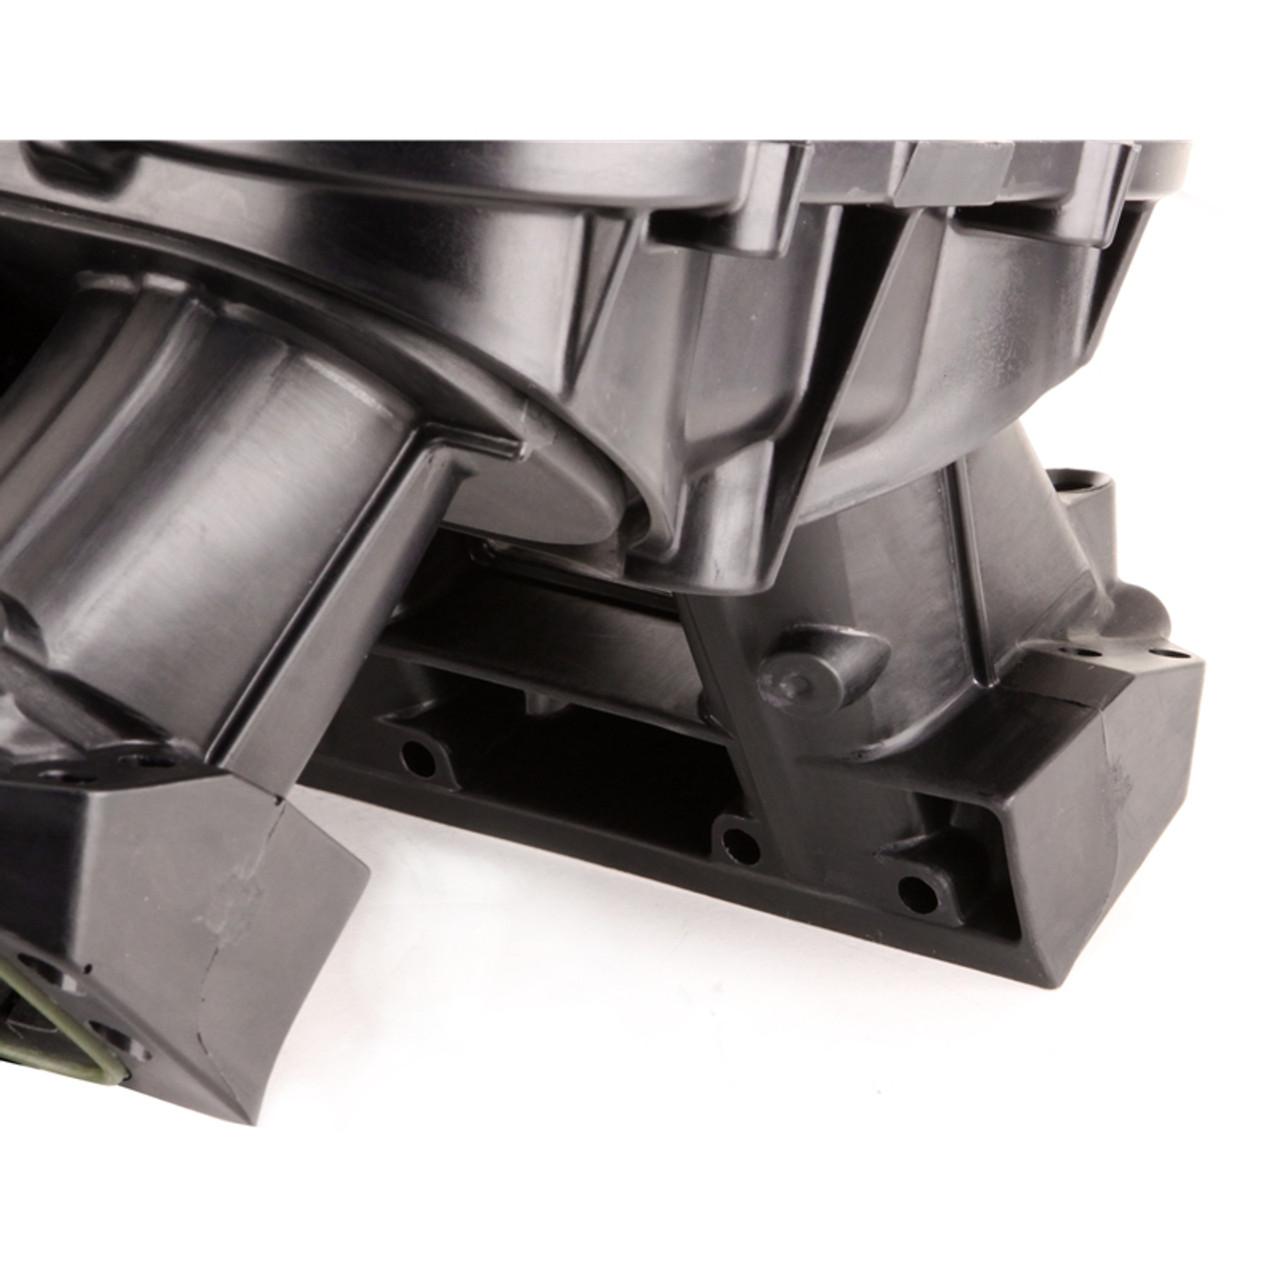 Performance Design Carbon pTR Intake Manifold   Cathedral Port